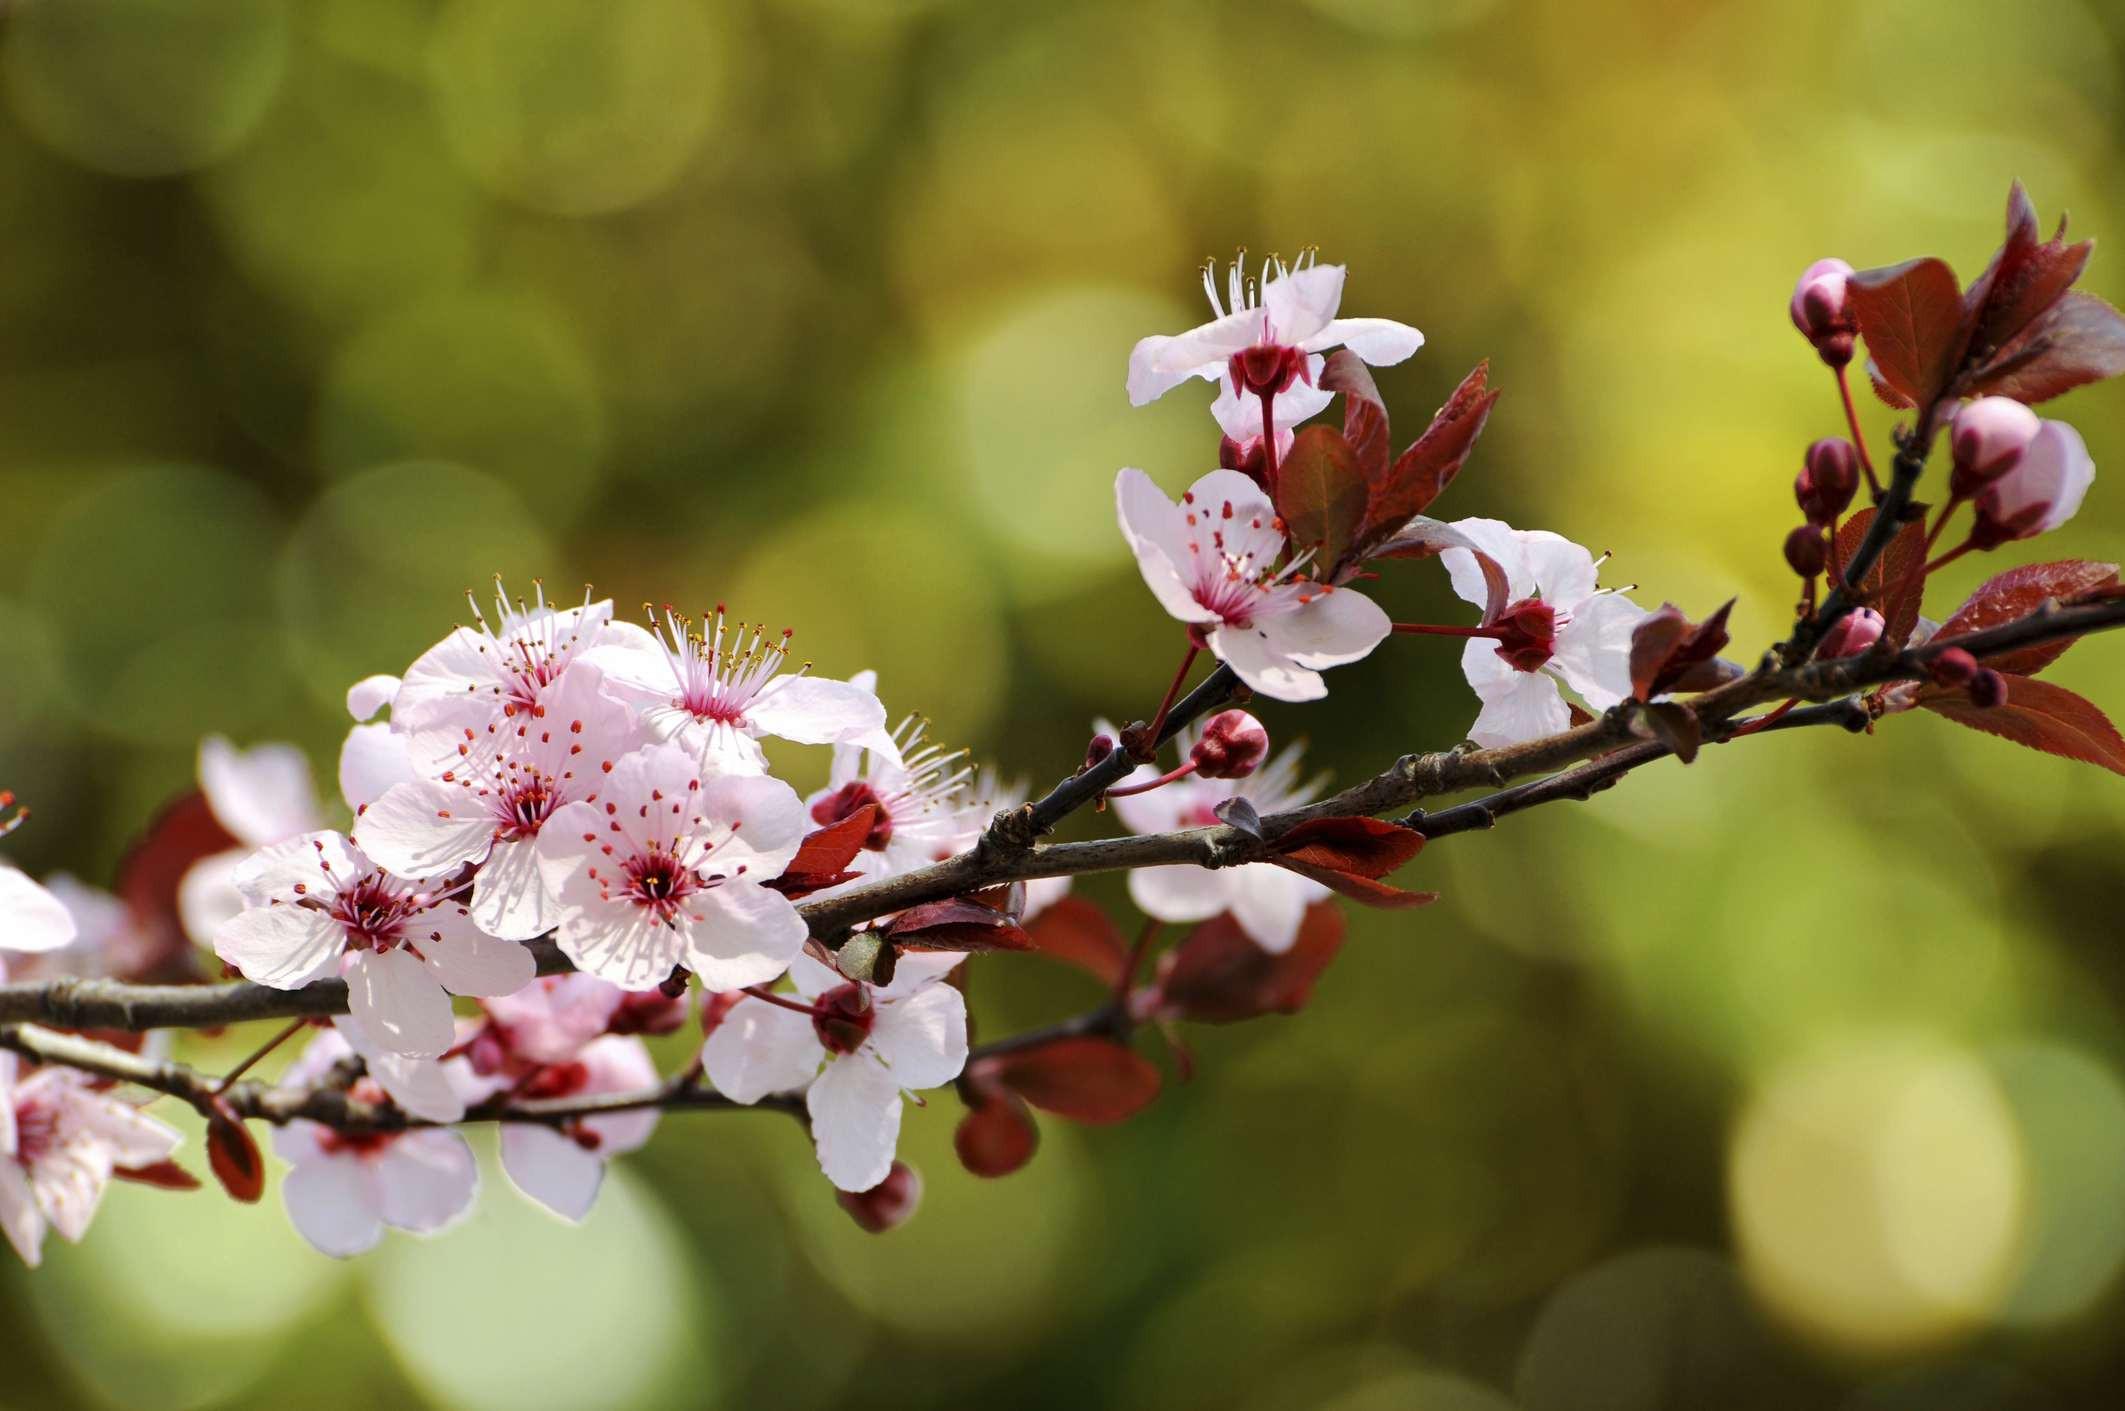 sand cherry blooming branch big 5b356e62c9e77c